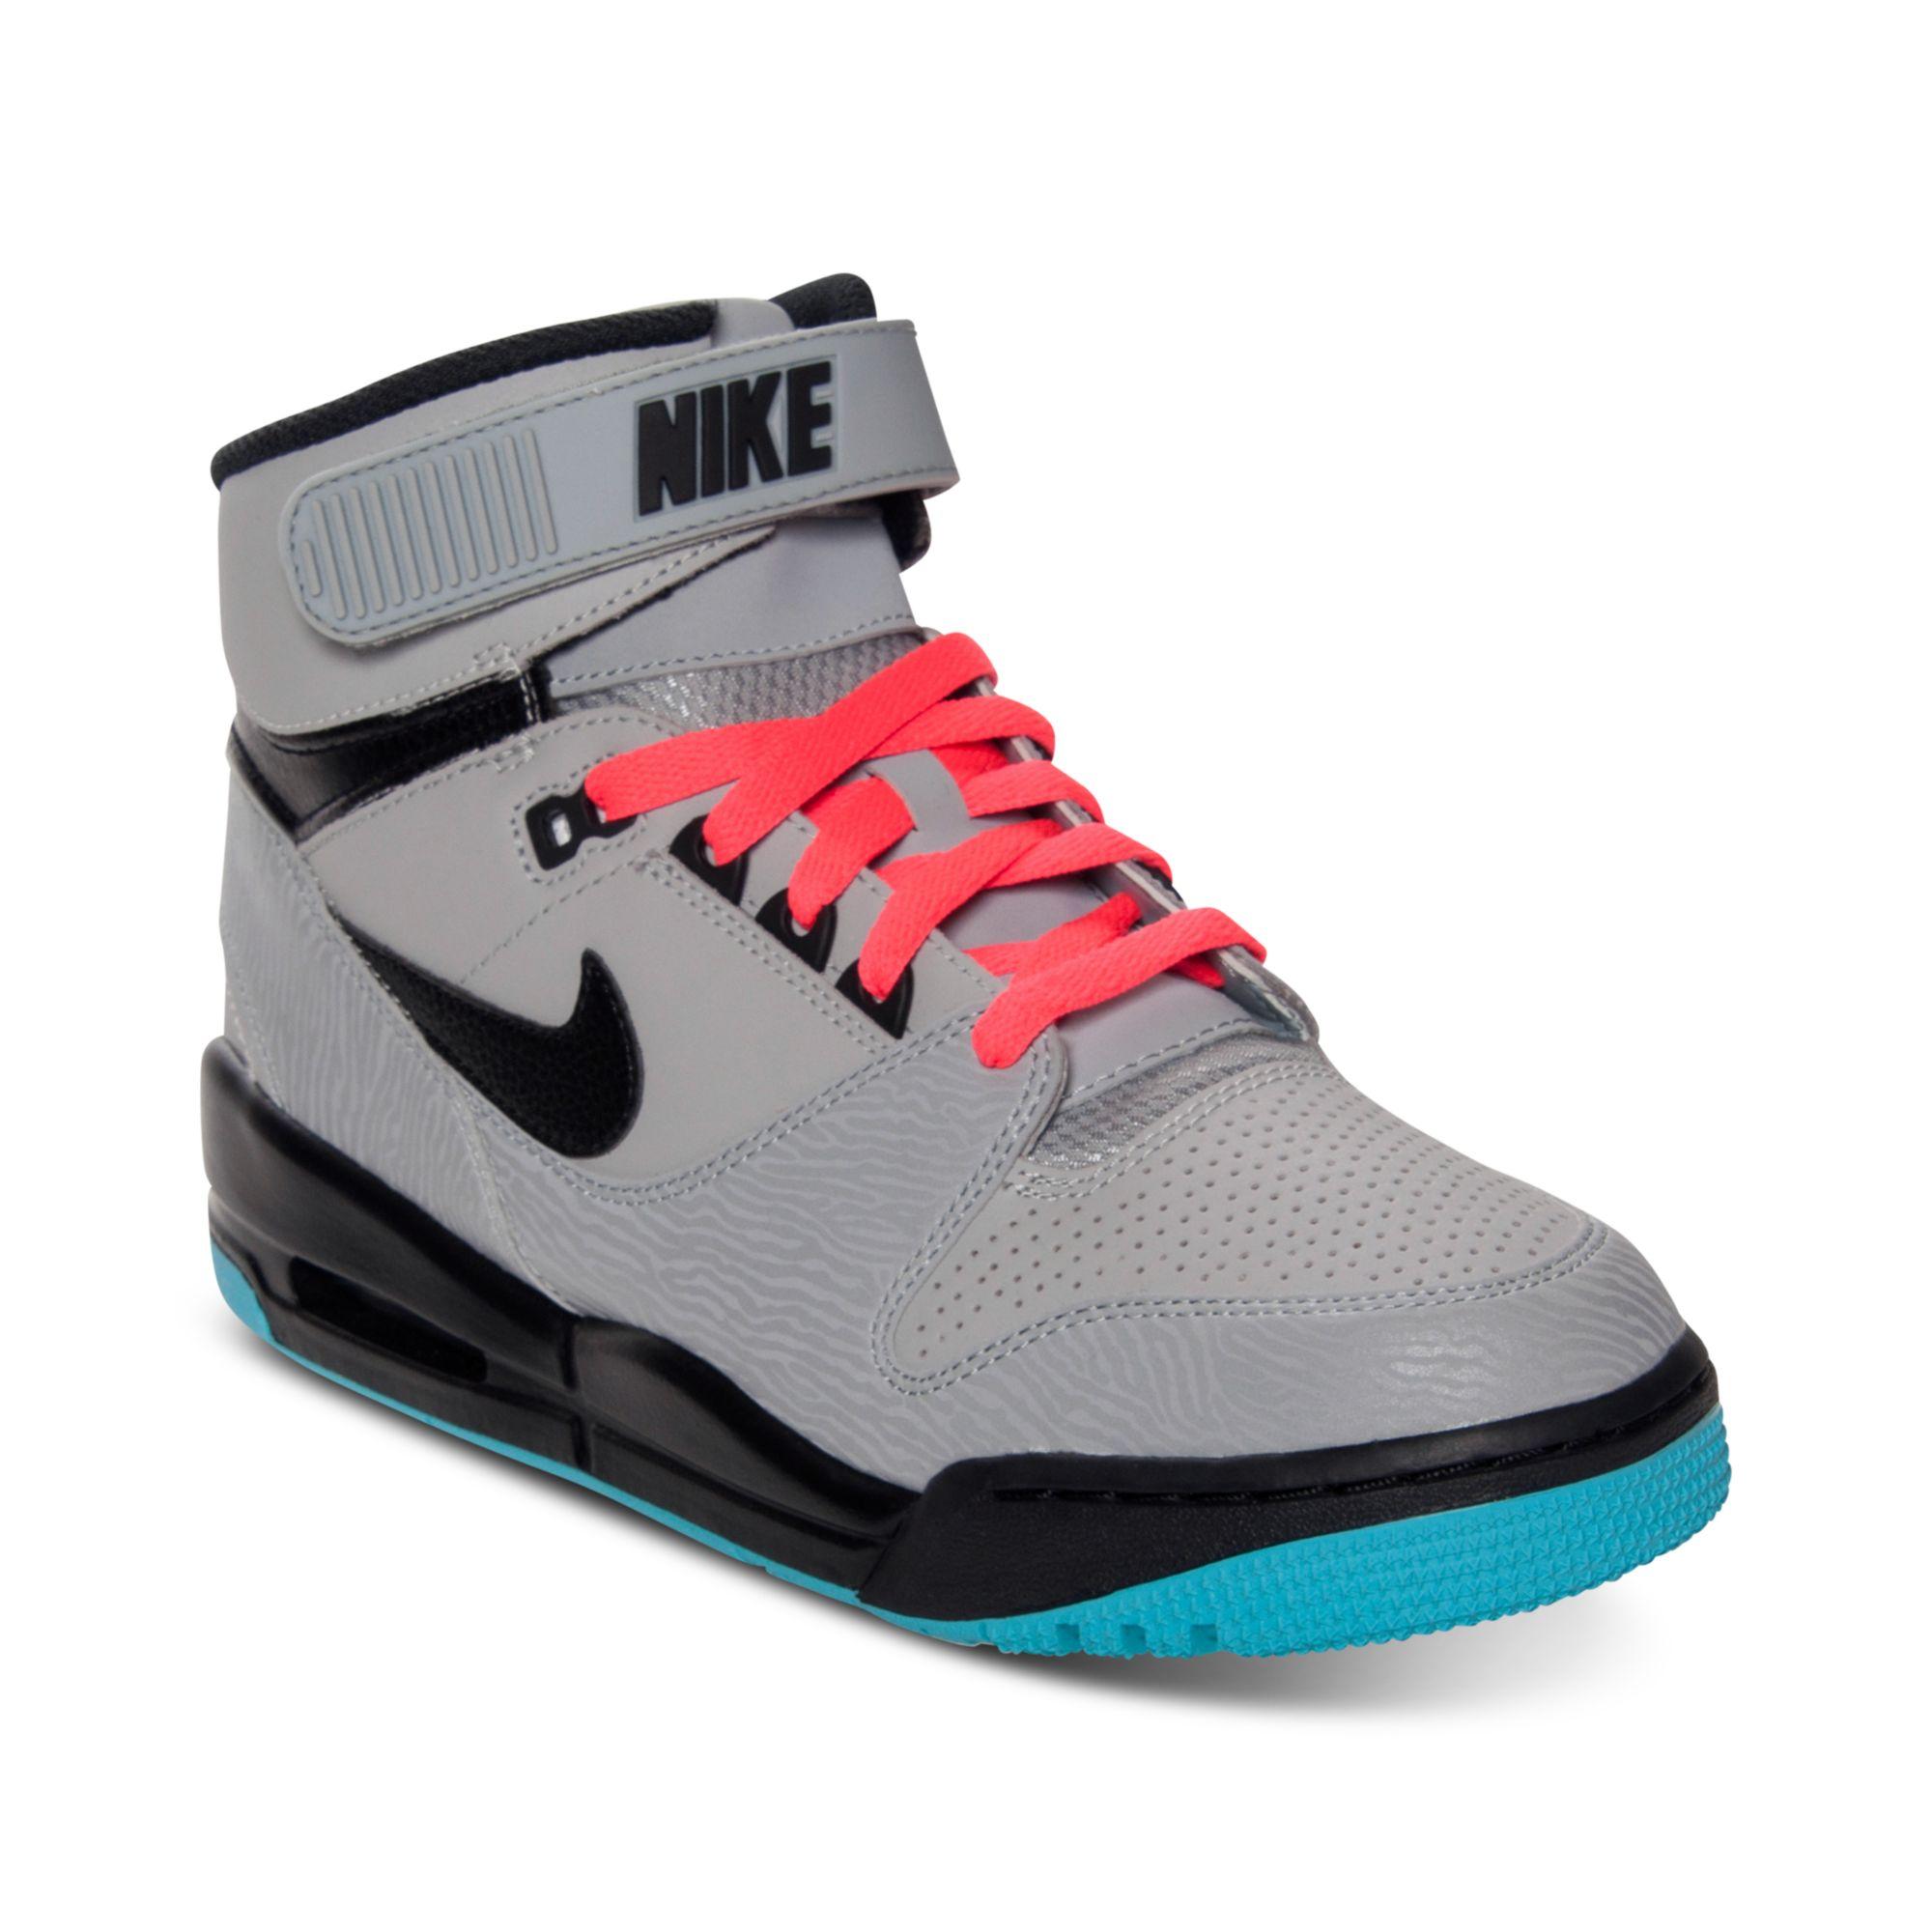 Nike Air Revolution Basketball Shoes